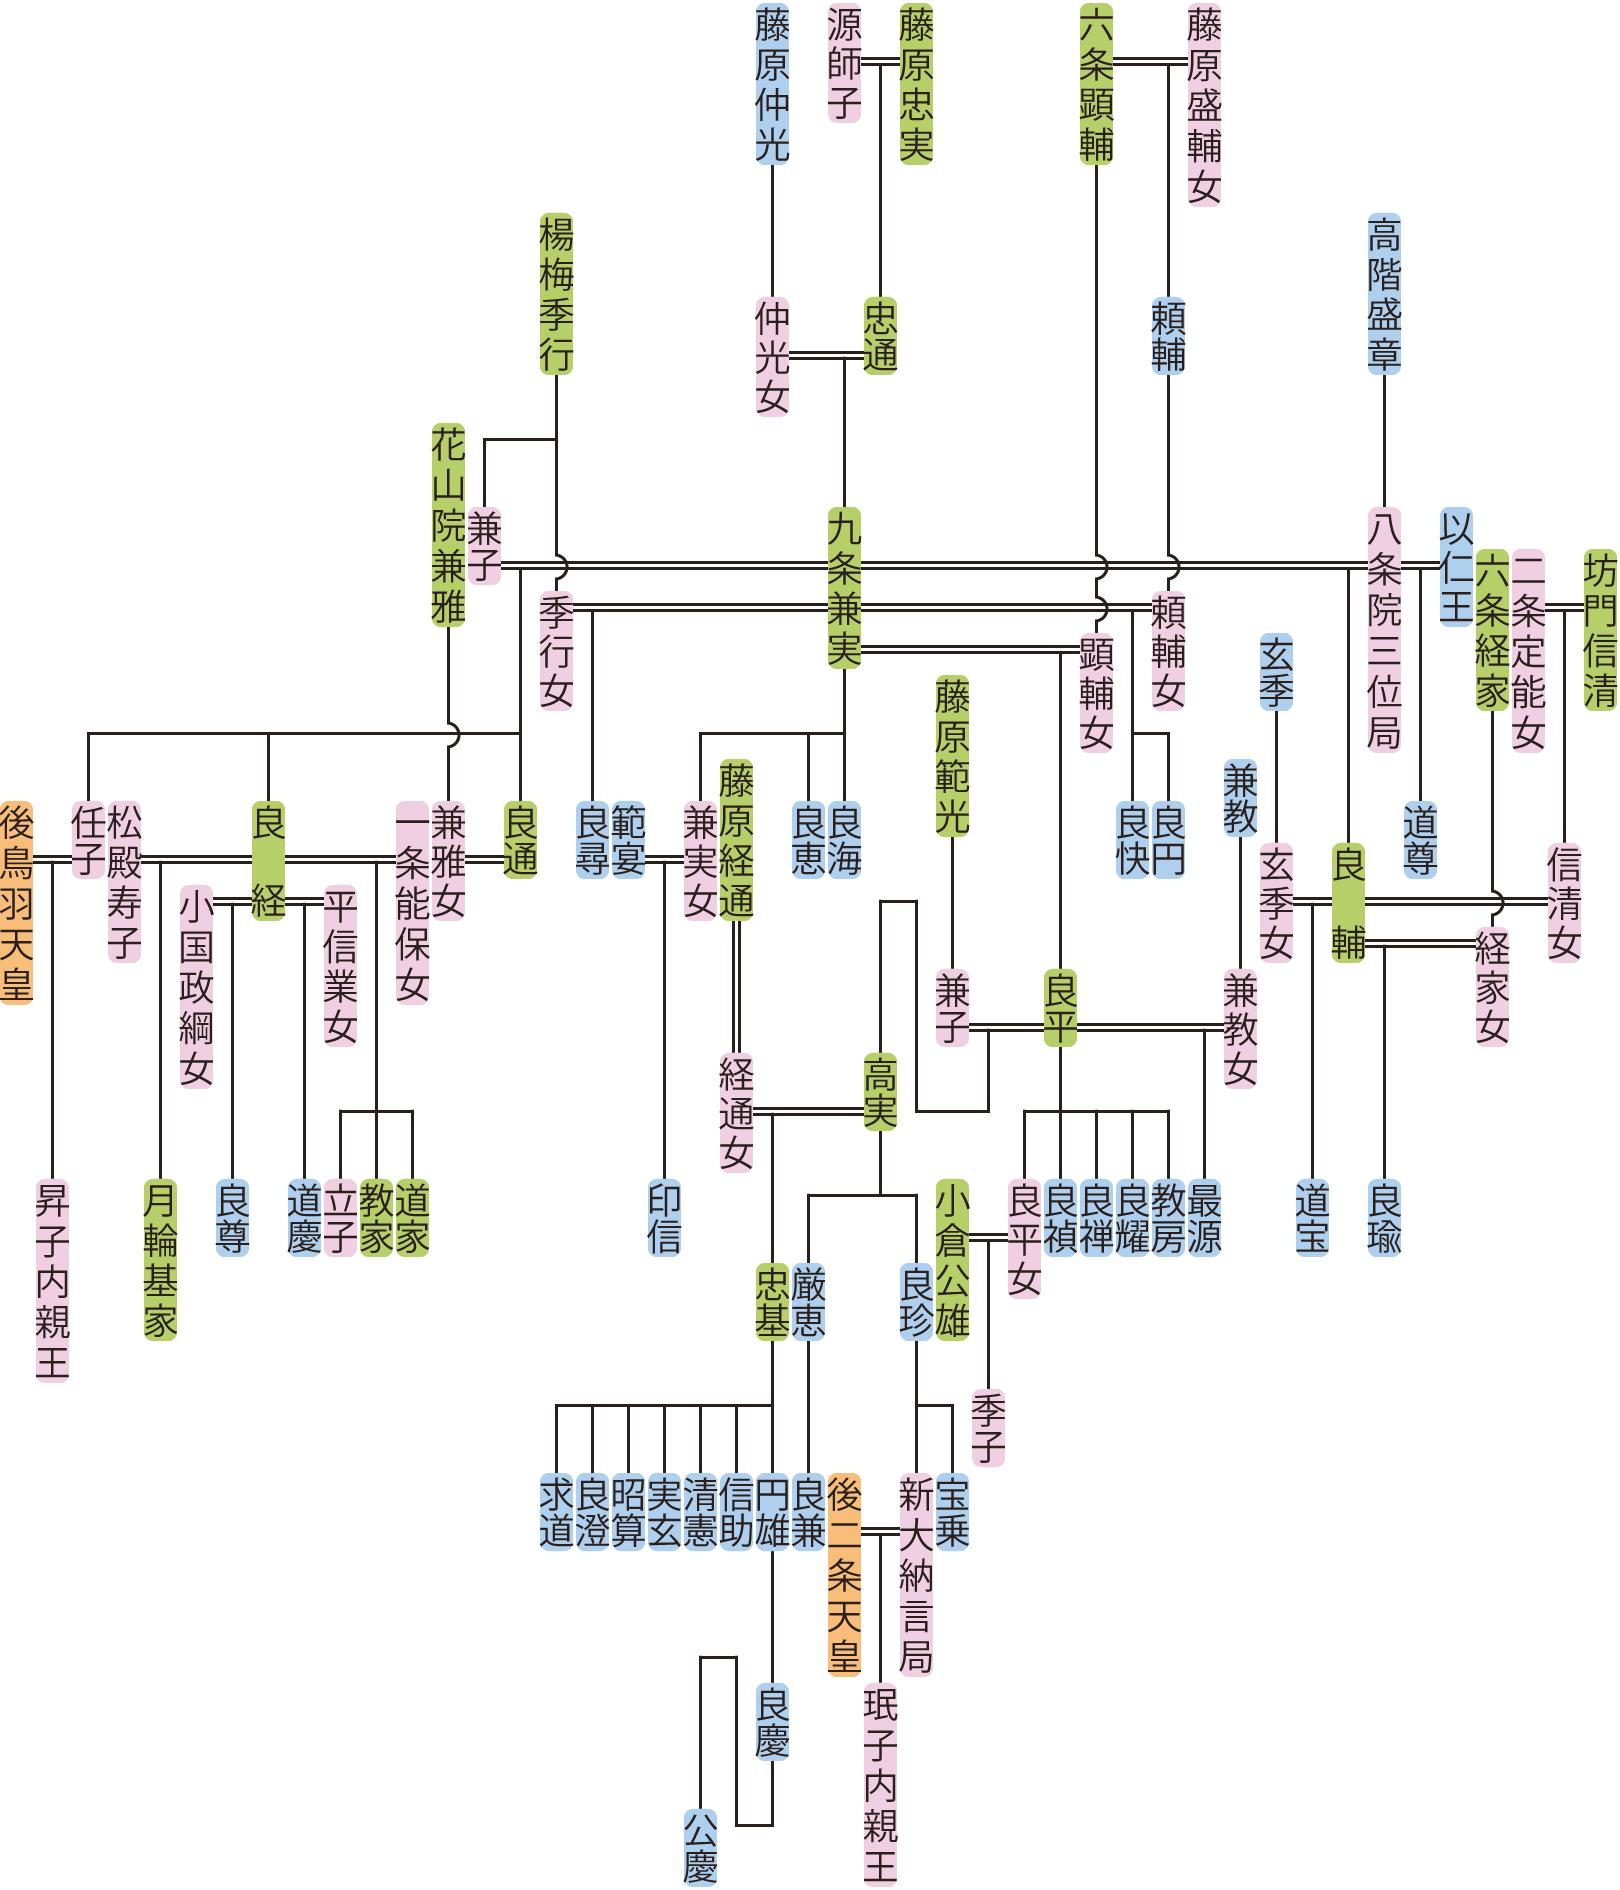 九条兼実の系図